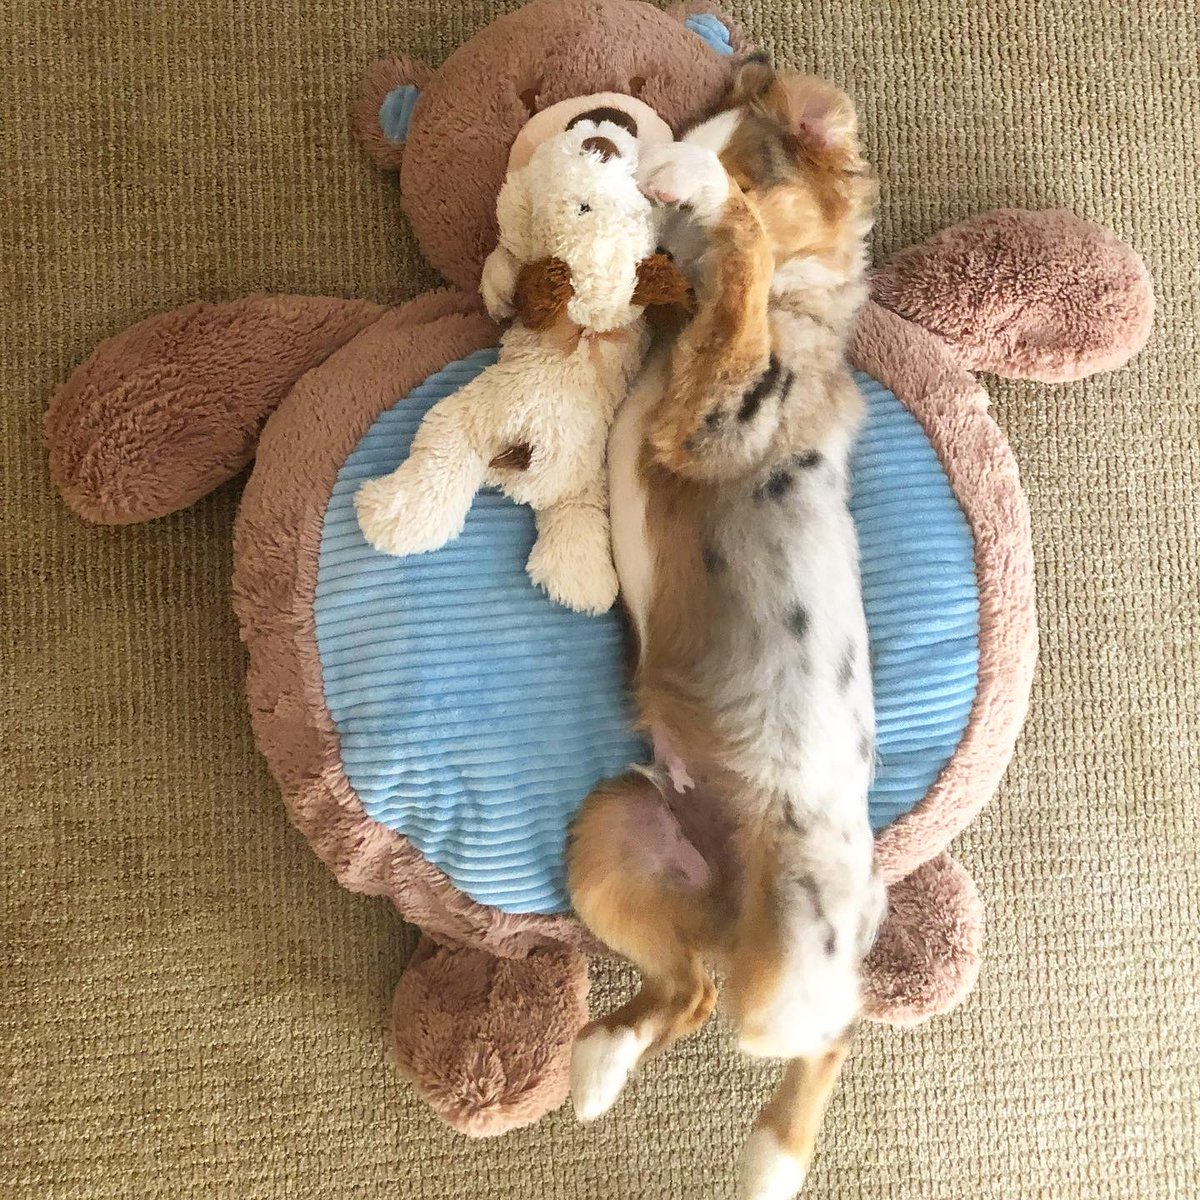 Really, isn't it friday yet? @WeLoveDogsUSA @dog_rates @lovedogandco @dog_feelings #thecuriousmaxx  #australianshepherdsofinstagram #aussielove #aussies #aussiesdoingthings #miniamericanshepherd #australianshepherd #aussie #miniaussie #aussielovers #australianshepherdspic.twitter.com/2dK0NUQN8D